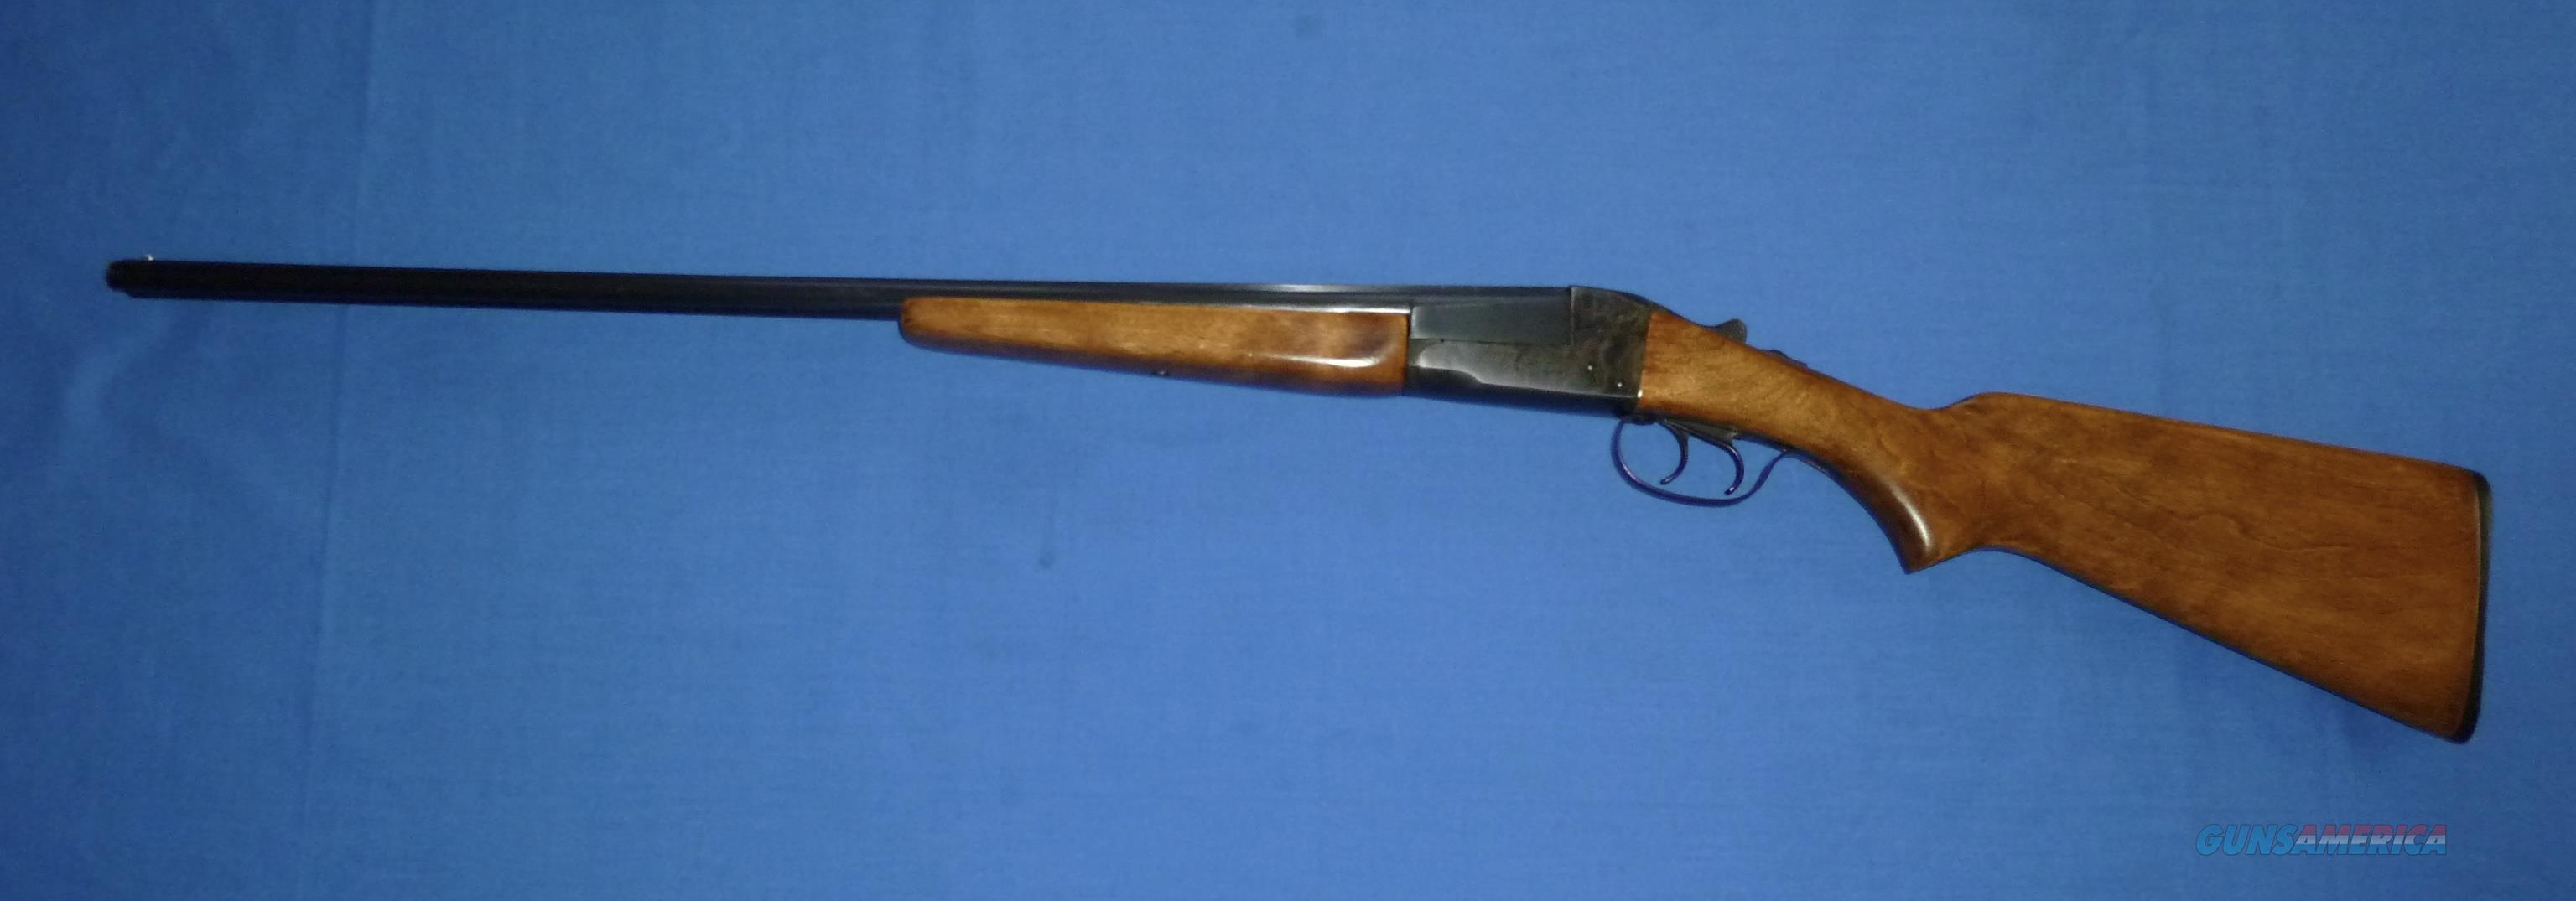 STEVENS 311A 410 GAUGE DOUBLE BARREL SHOTGUN